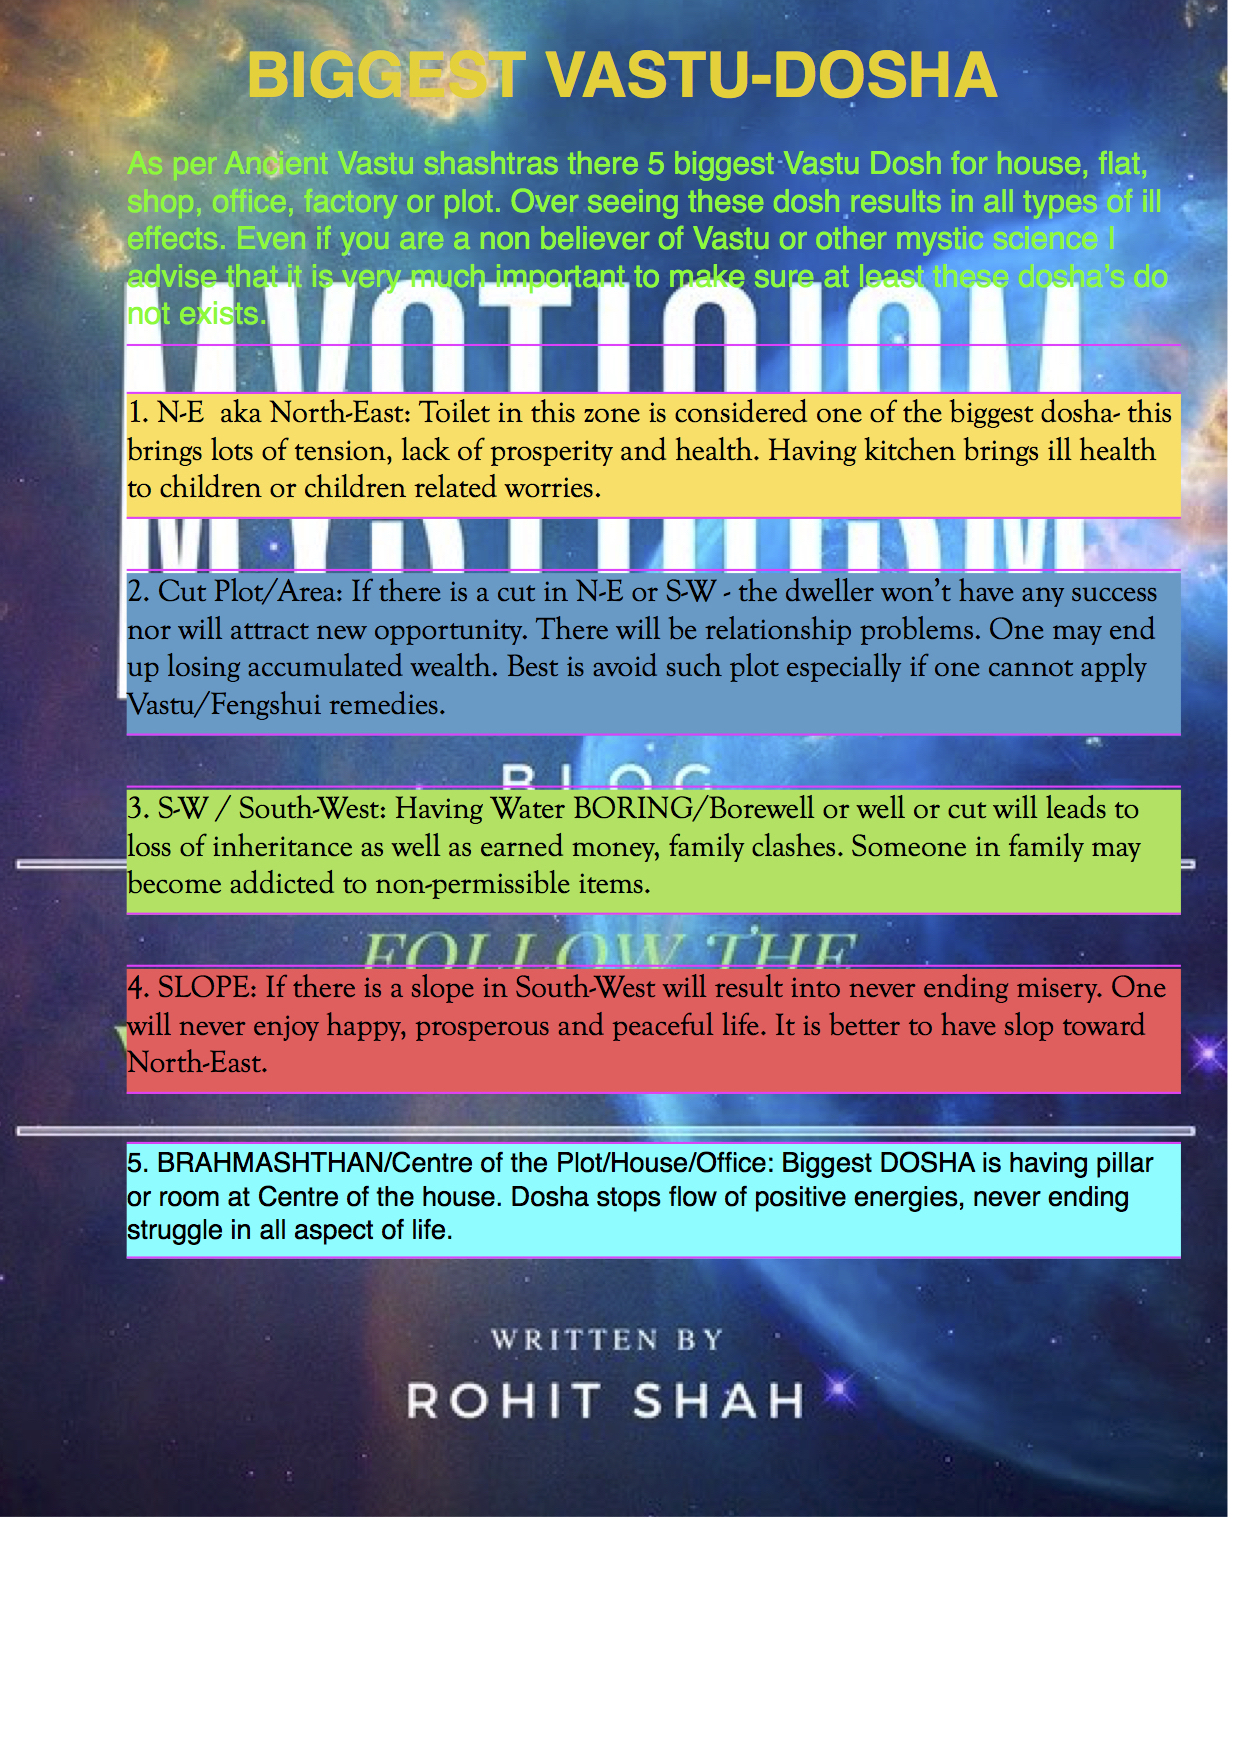 Biggest Vastu Dosh OR Faults | Mystic Solutions Blog